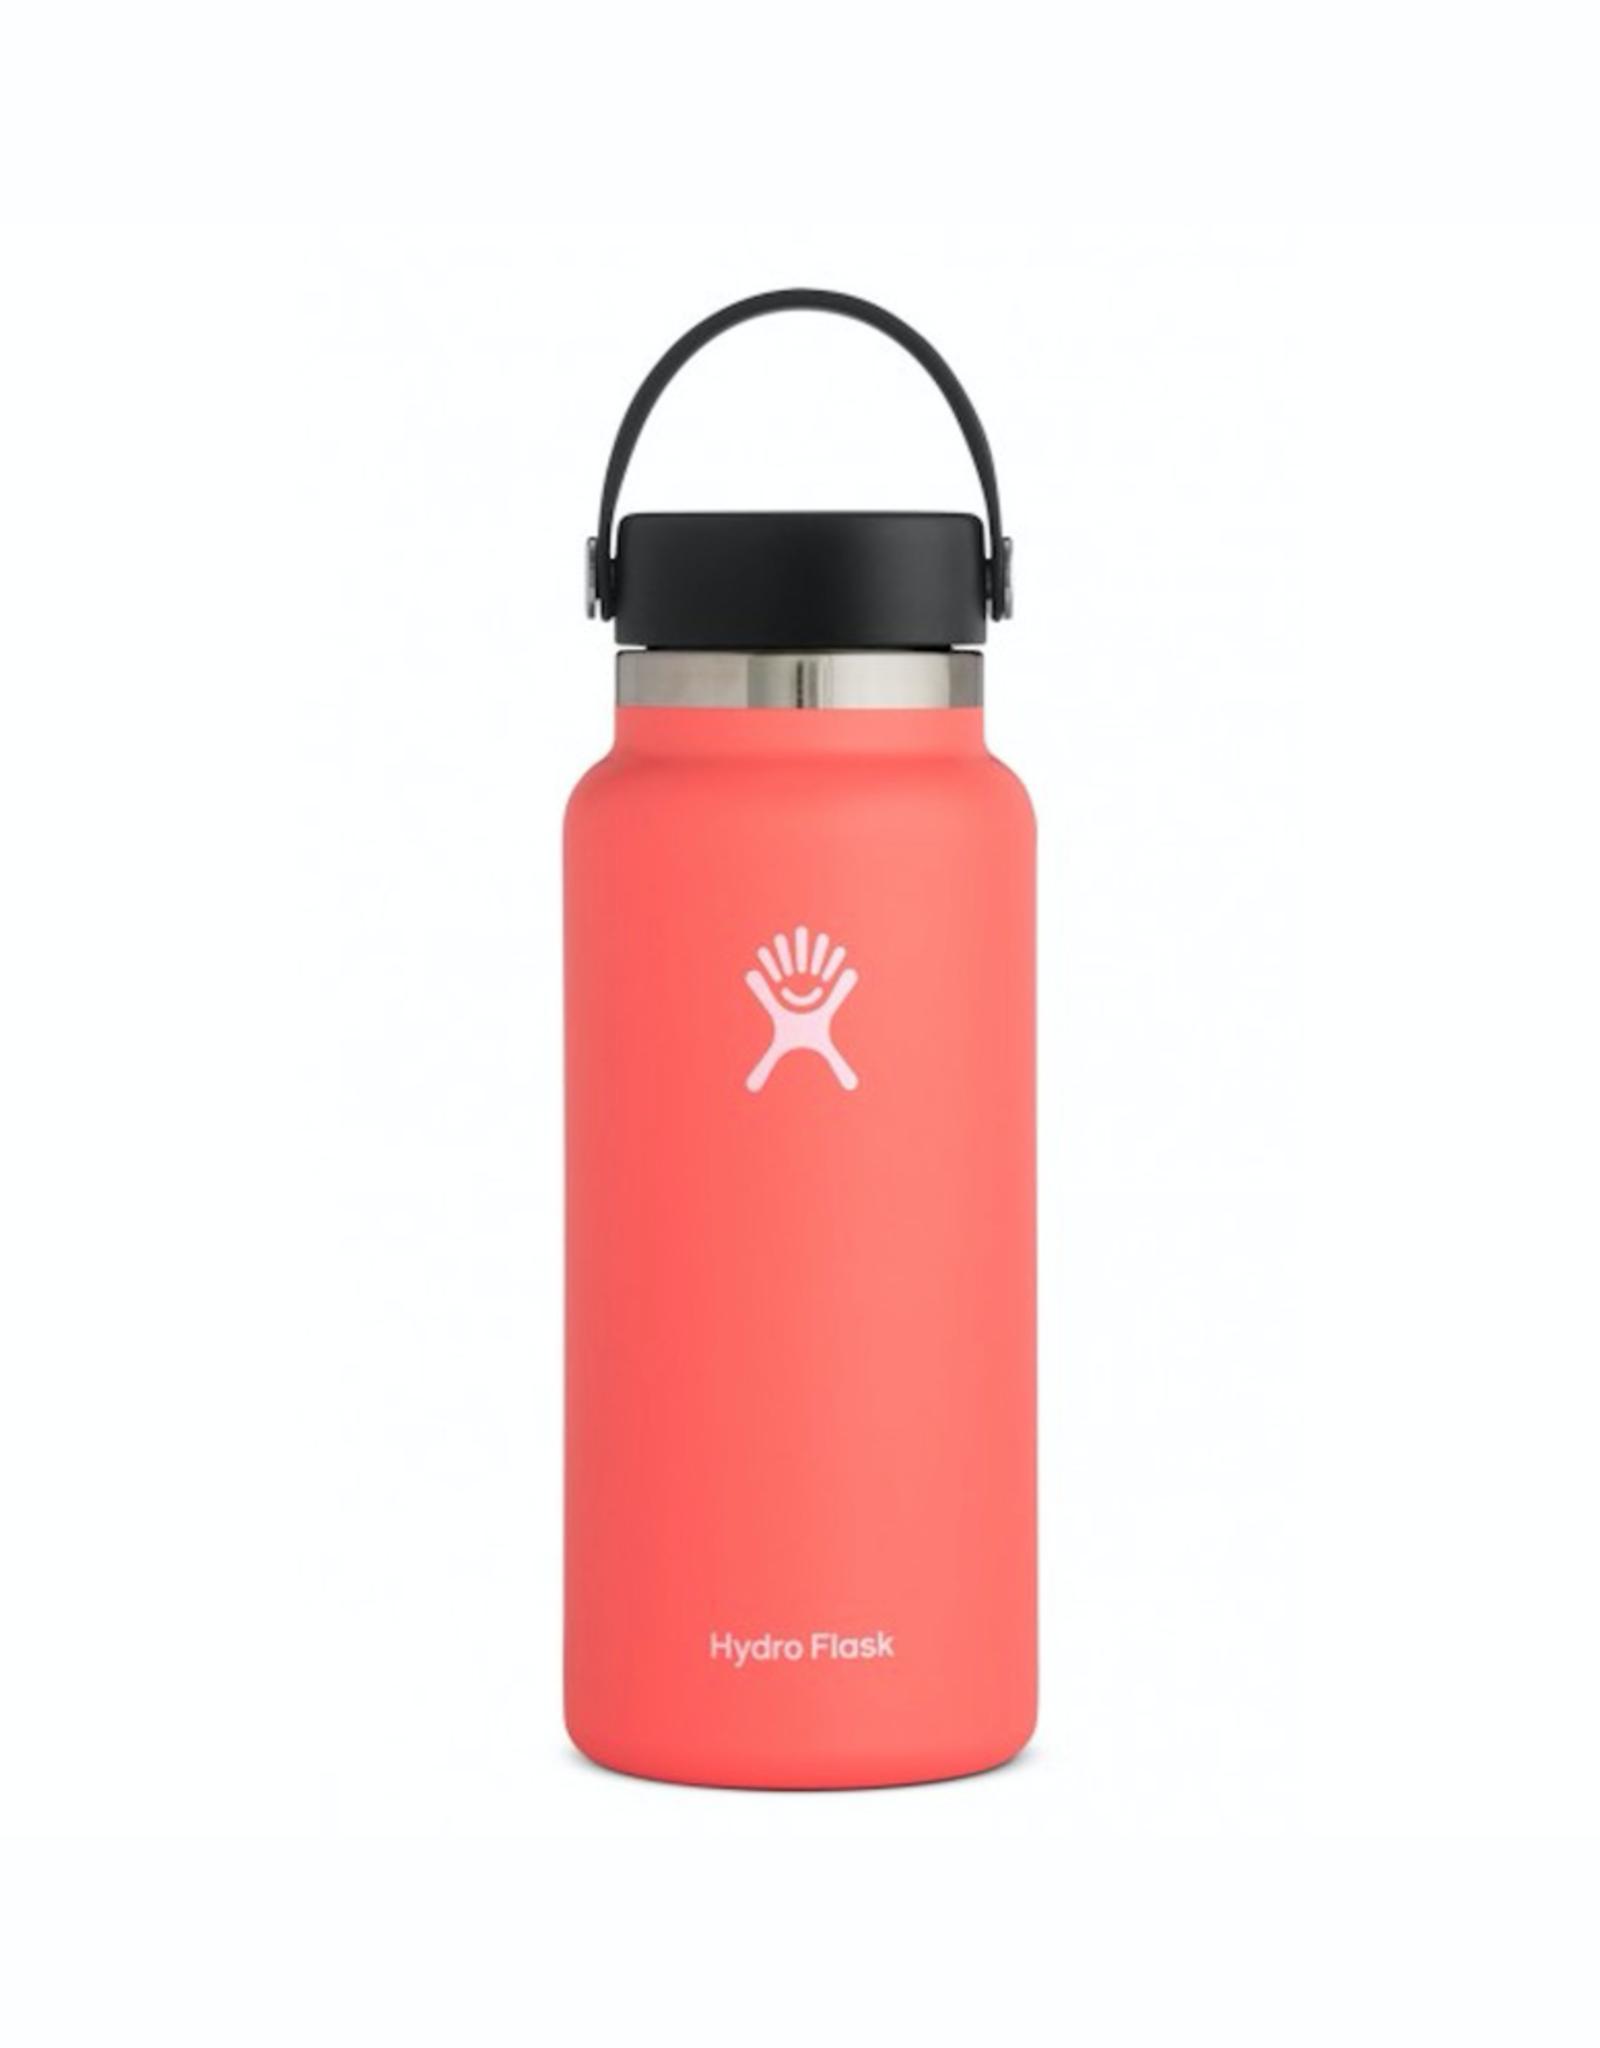 Hydro Flask 32 oz Wide Mouth Flex Cap Bottle in Hibiscus